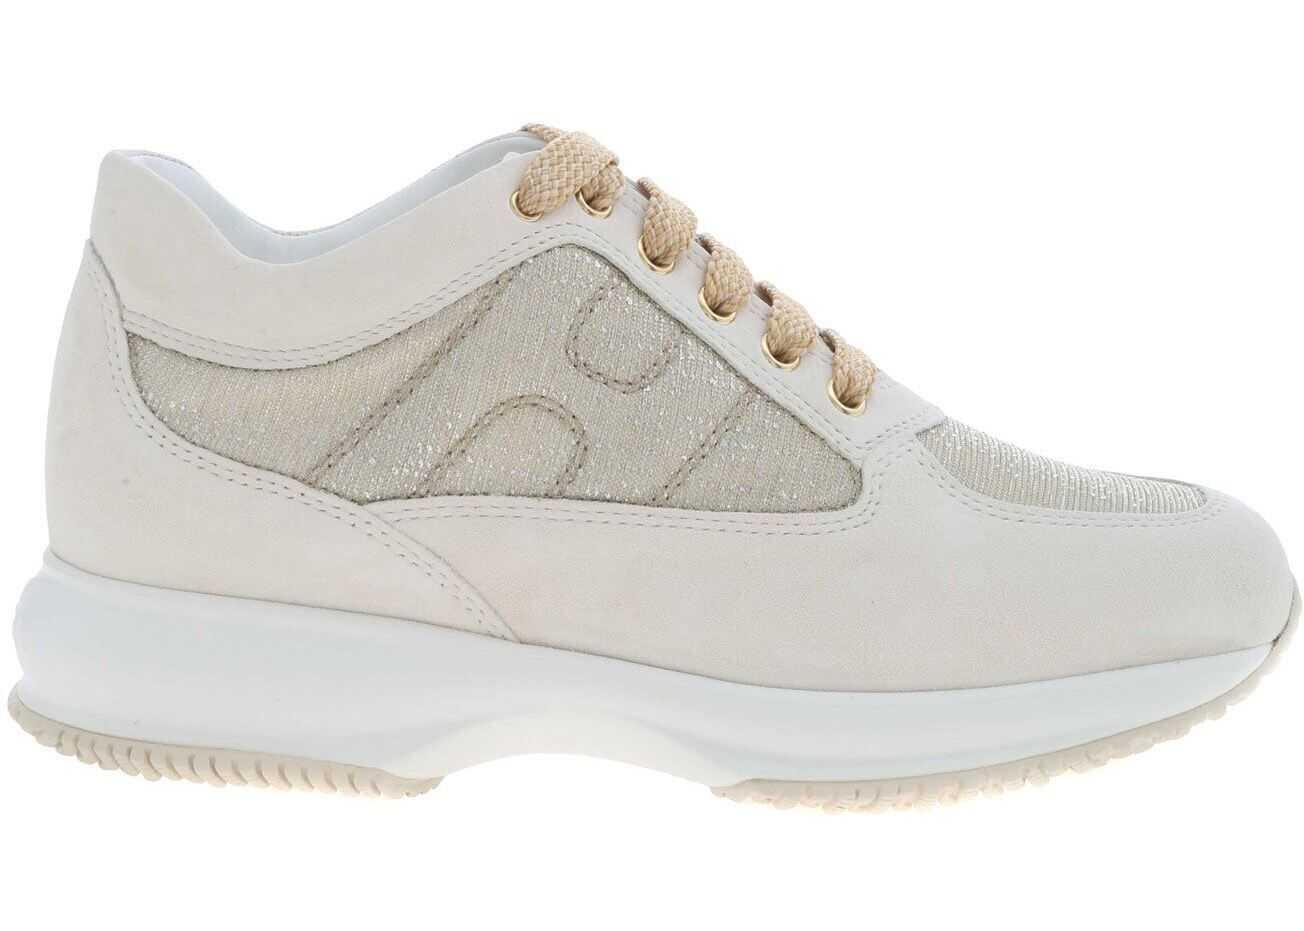 Hogan Interactive Sneakers In Cream Color White